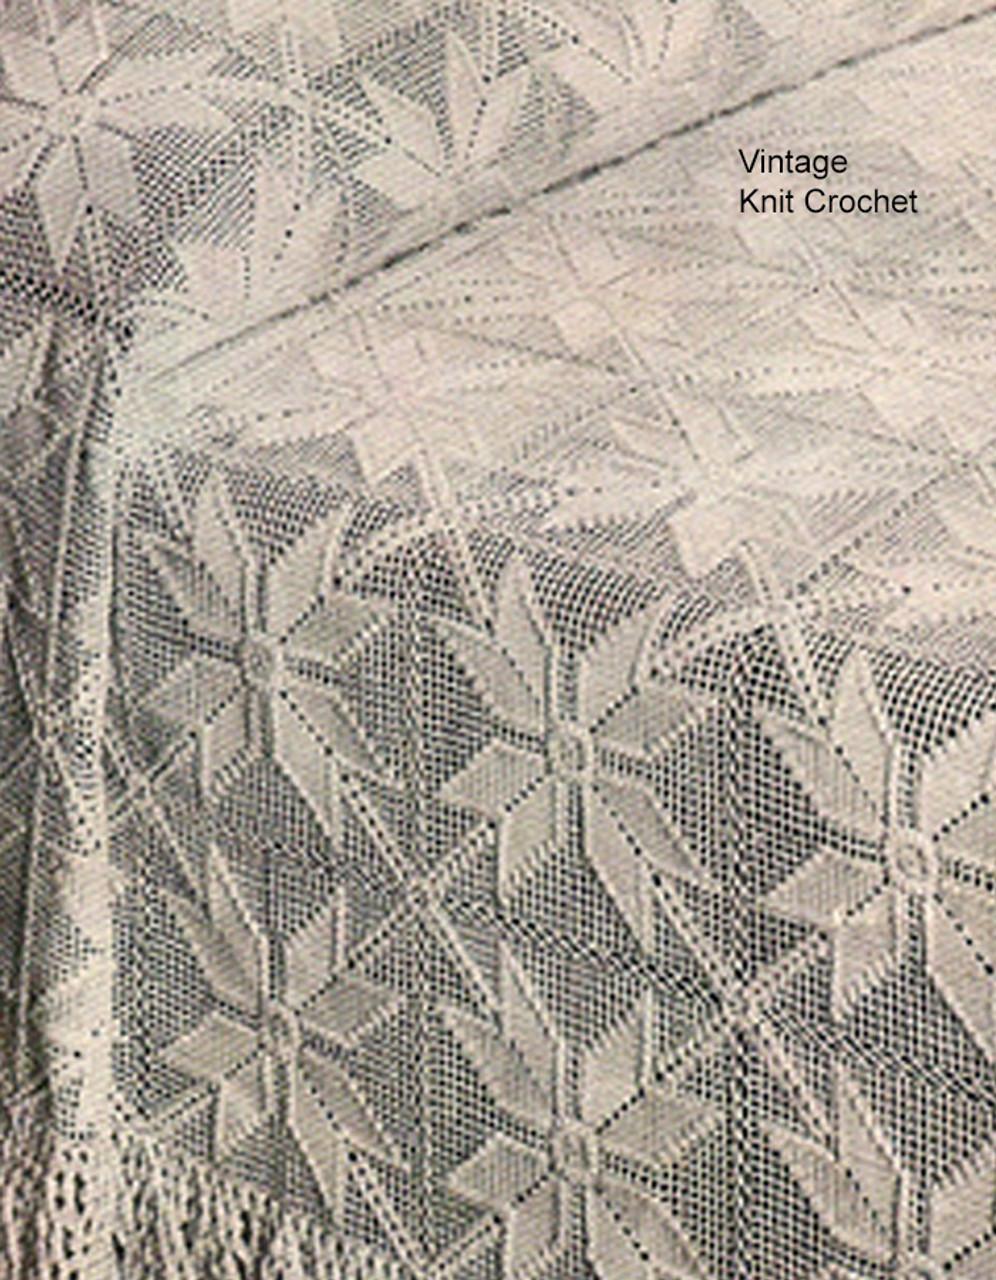 Crochet Bedspread Pattern, Square Blocks, All American